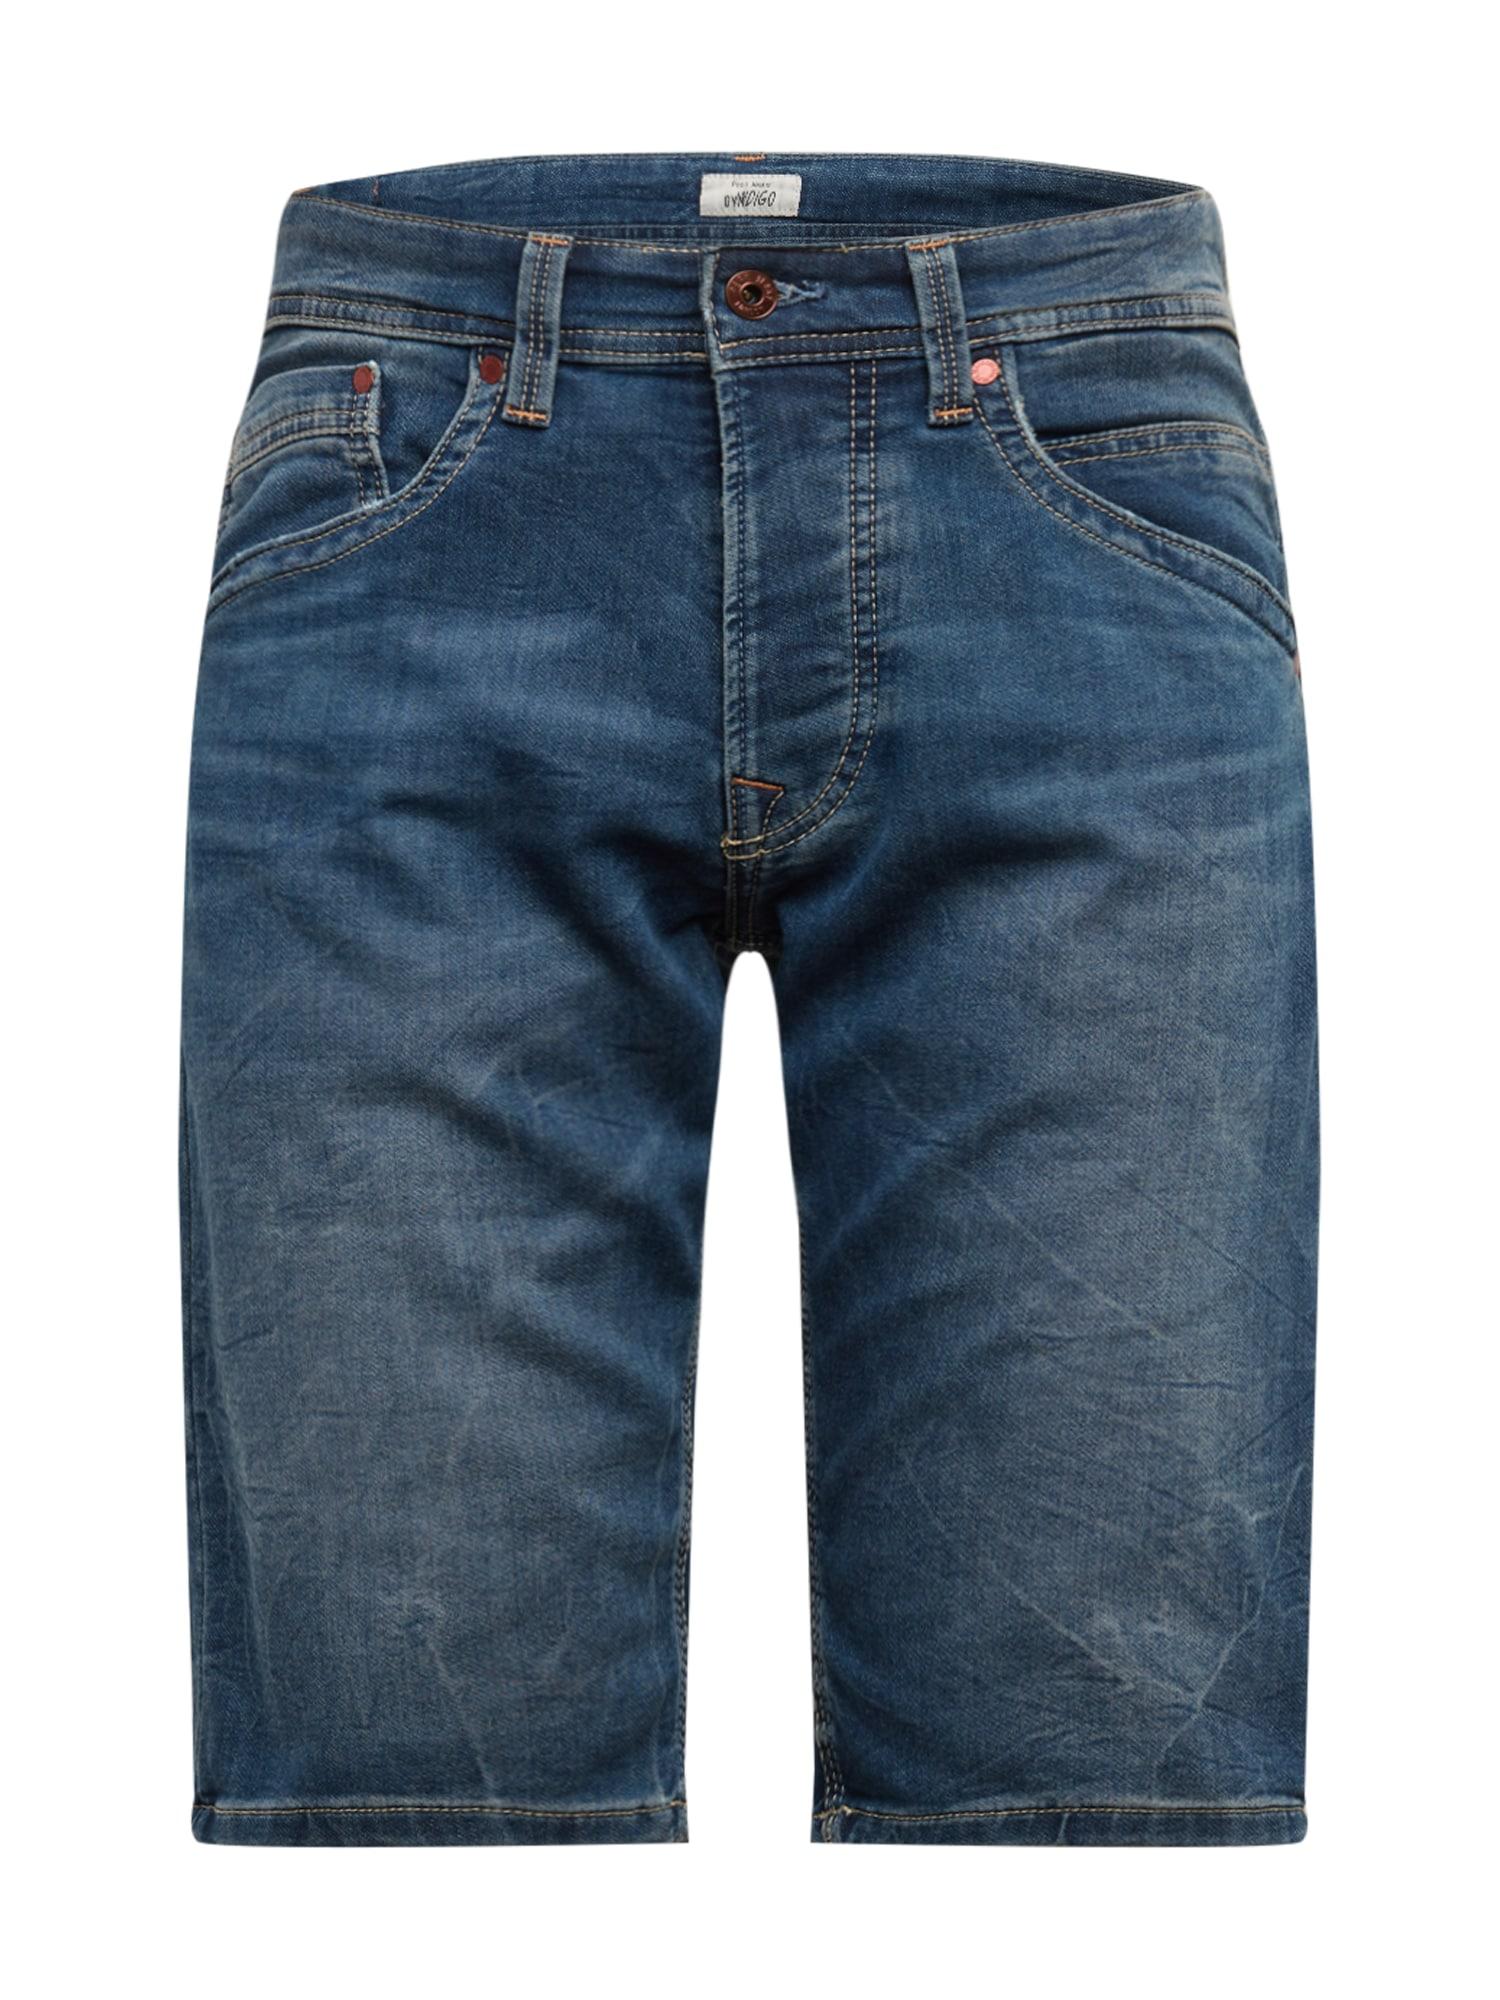 Pepe Jeans Farmer 'TRACK'  kék farmer